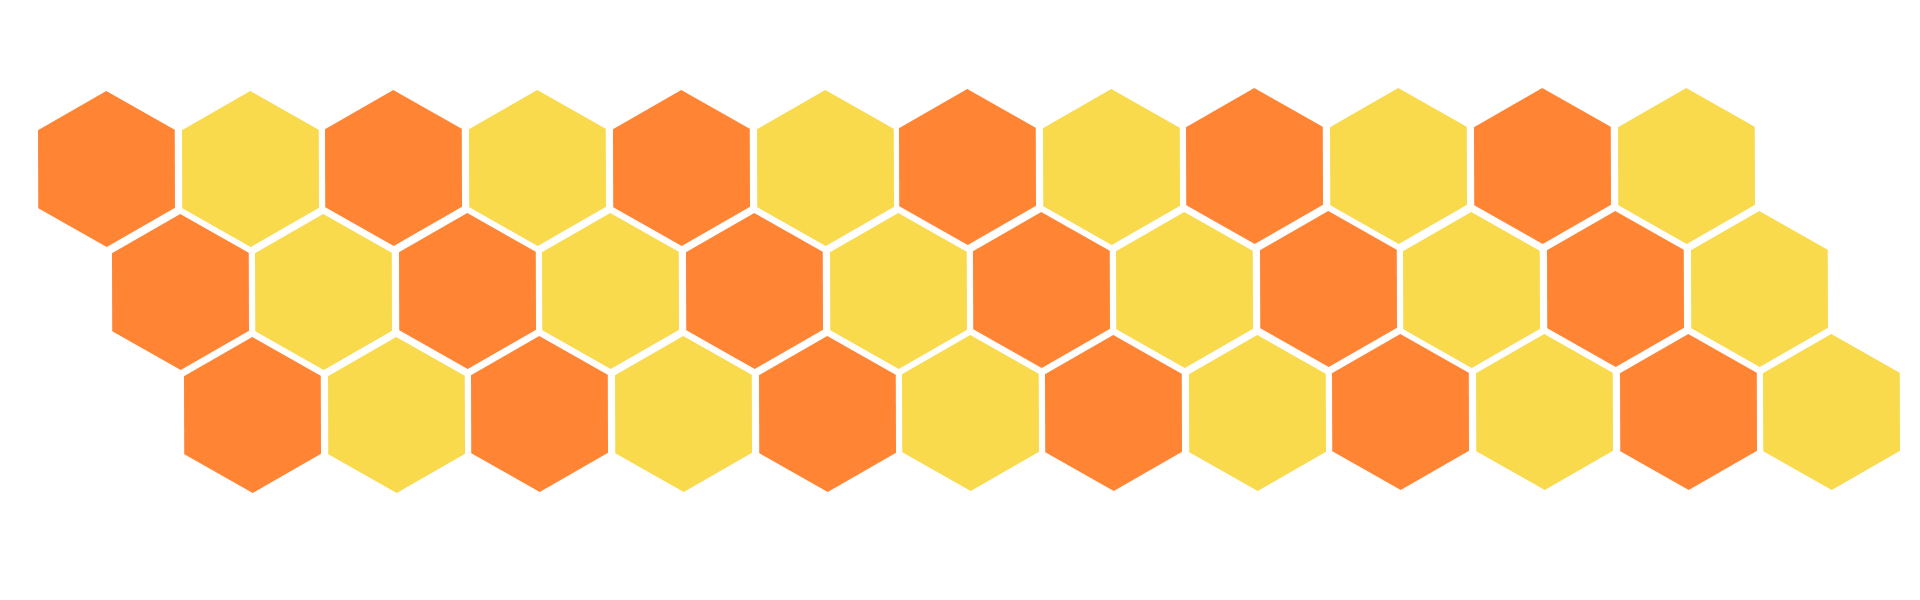 Bg graphic bggraphic. Honeycomb clipart single